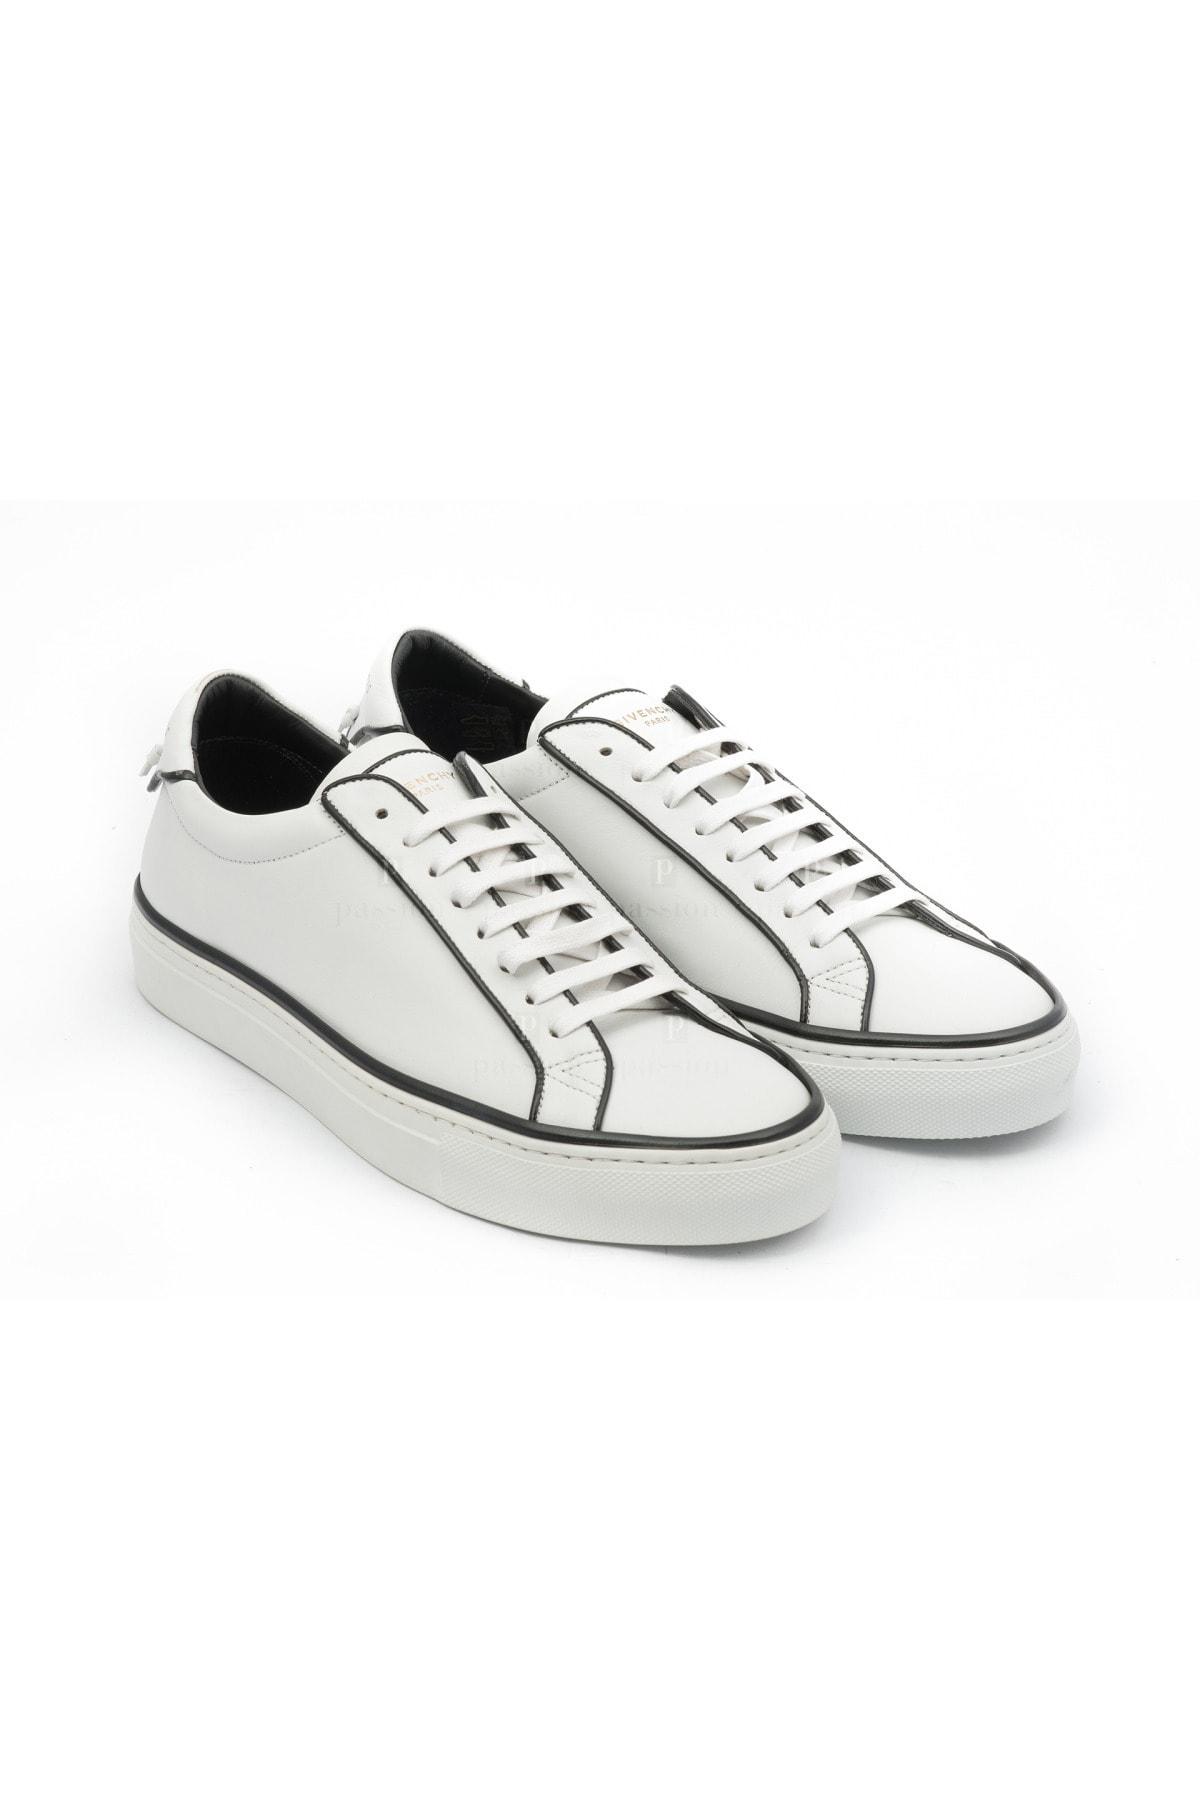 Givenchy Erkek Beyaz Sneakers 1